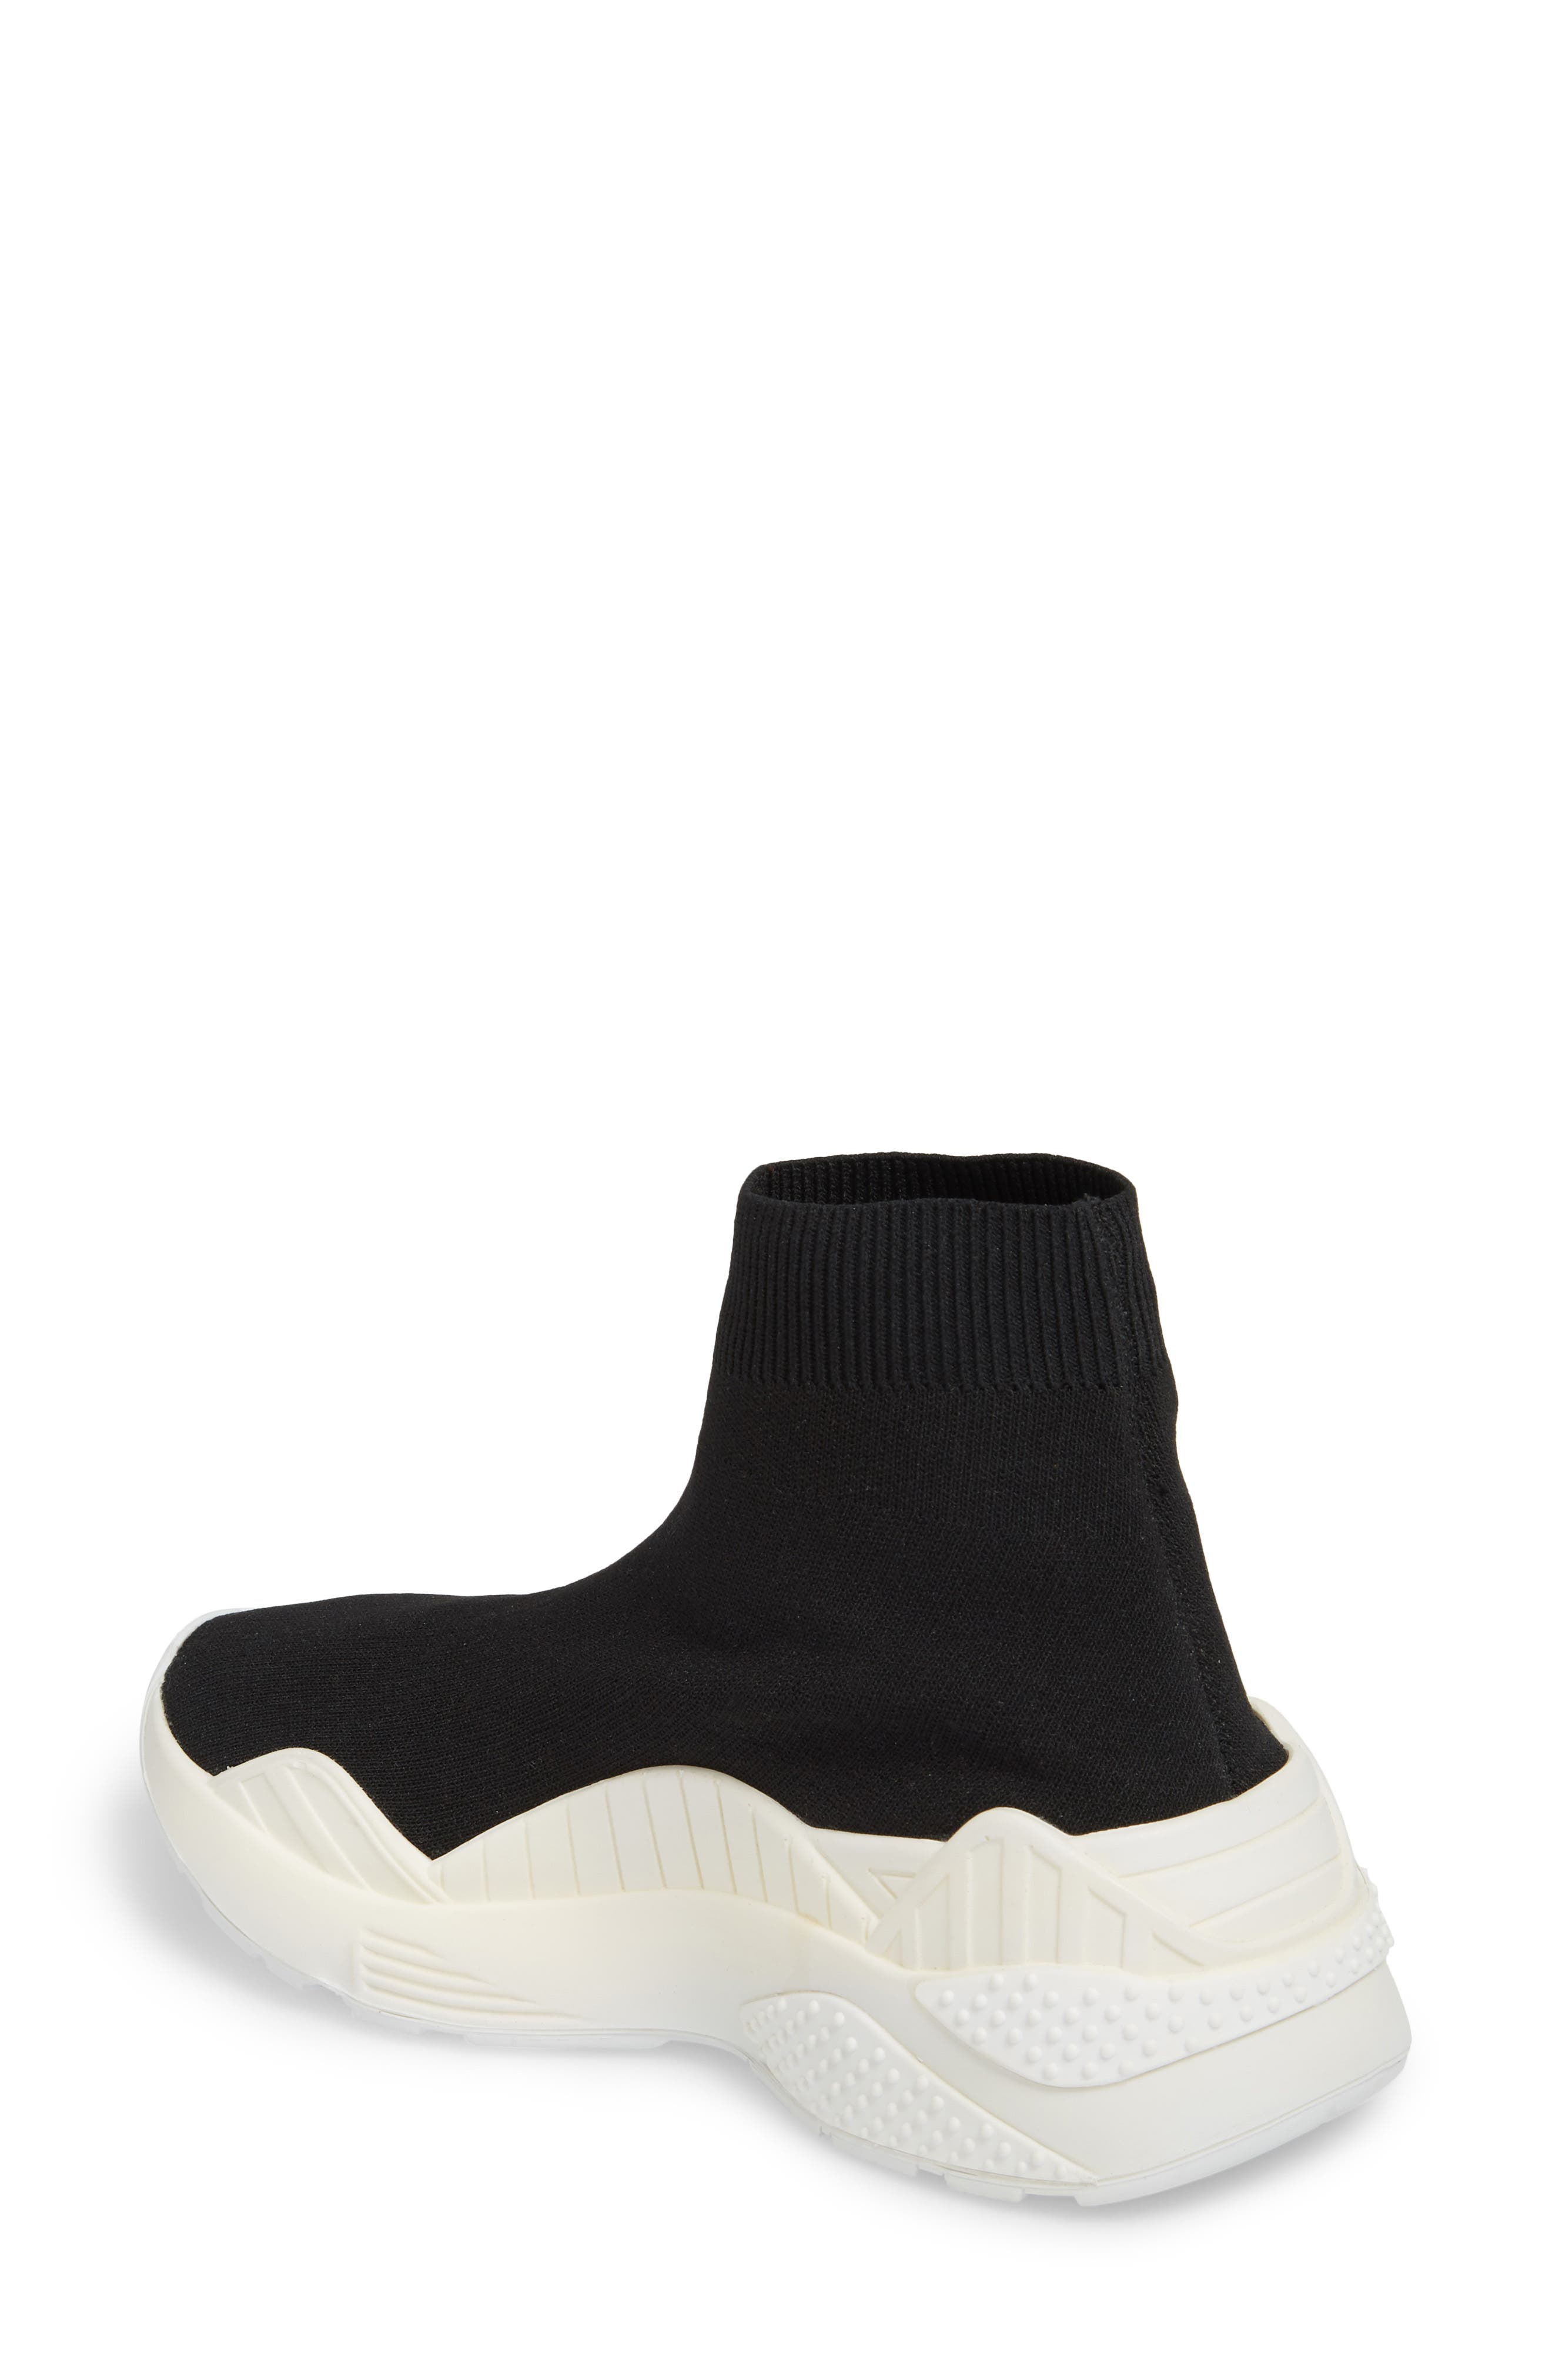 Lunix Sock Sneaker,                             Alternate thumbnail 2, color,                             014